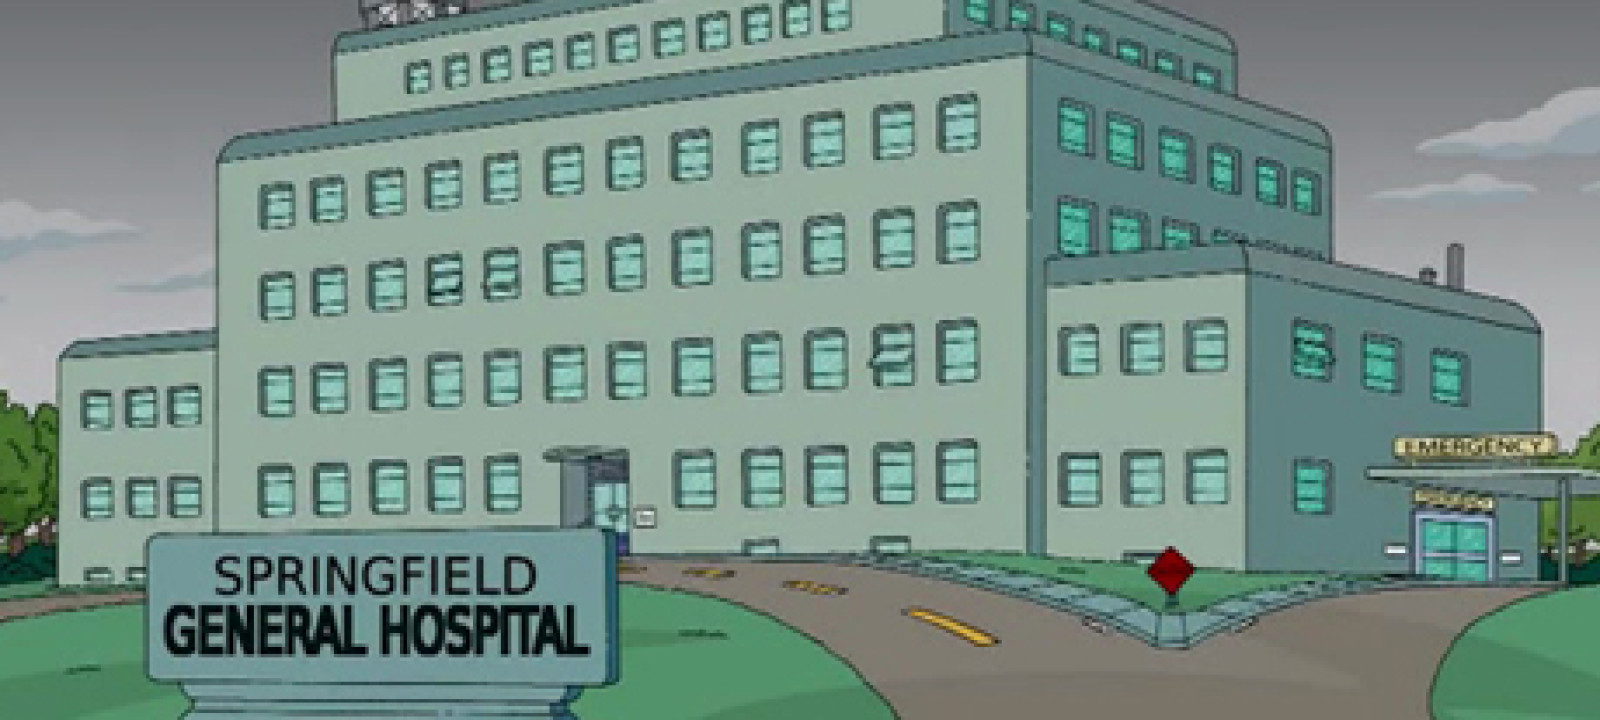 460x300_springfieldgeneralhospital